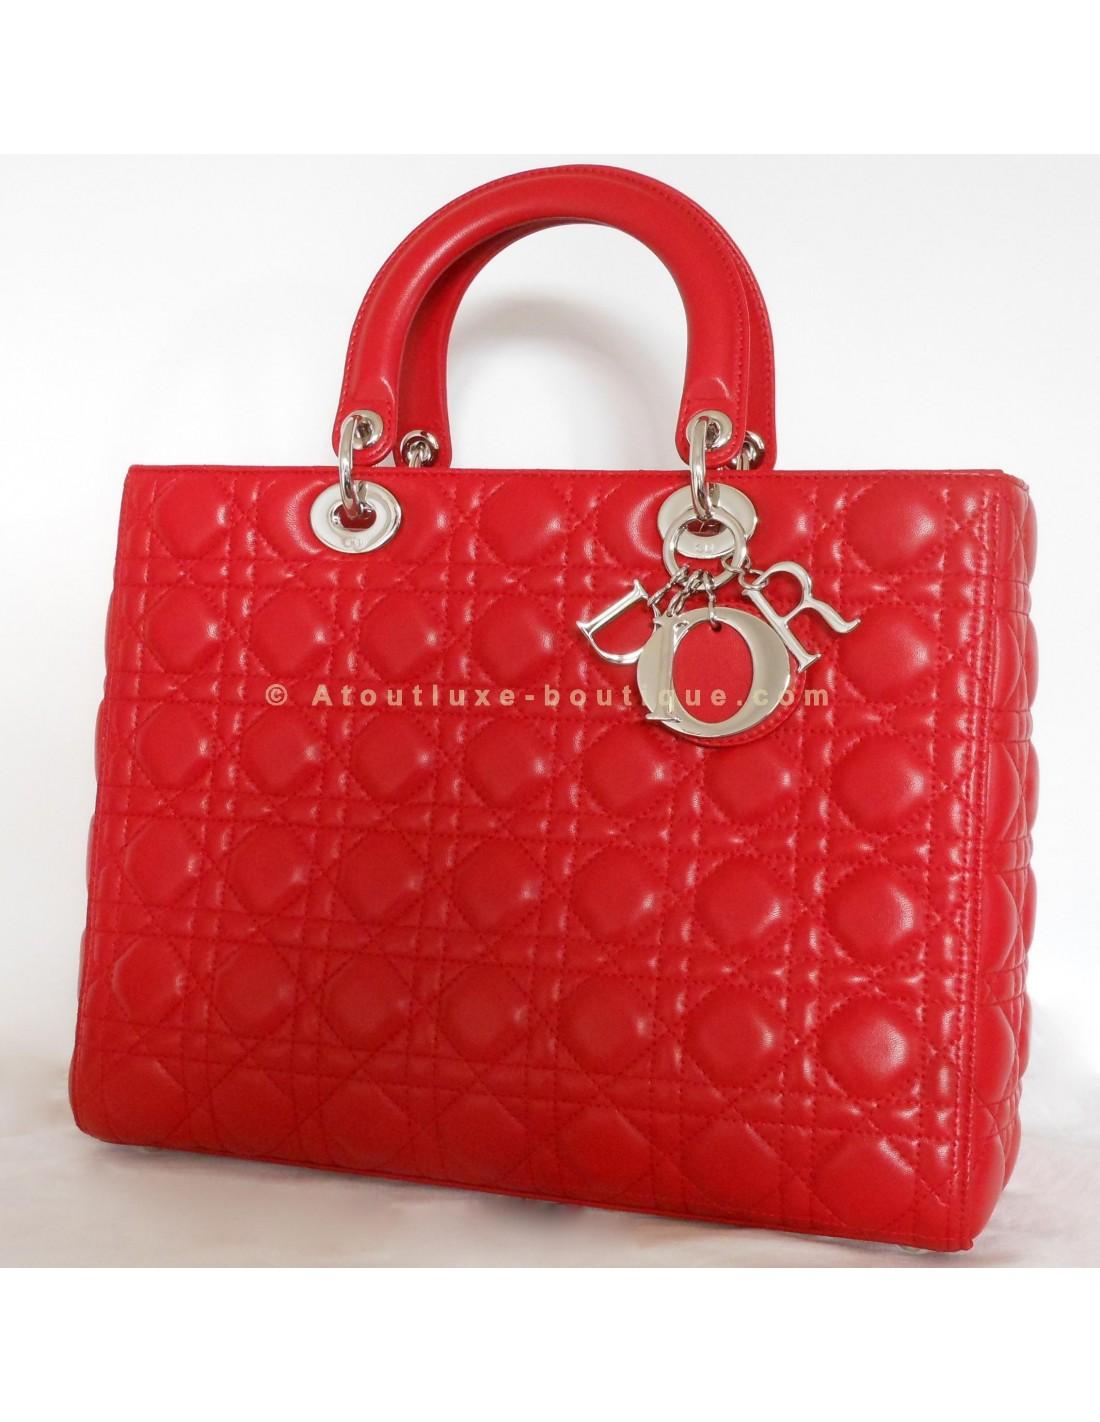 28a19b85360 SAC LADY DIOR ROUGE GRAND MODELE - Atoutluxe Boutique